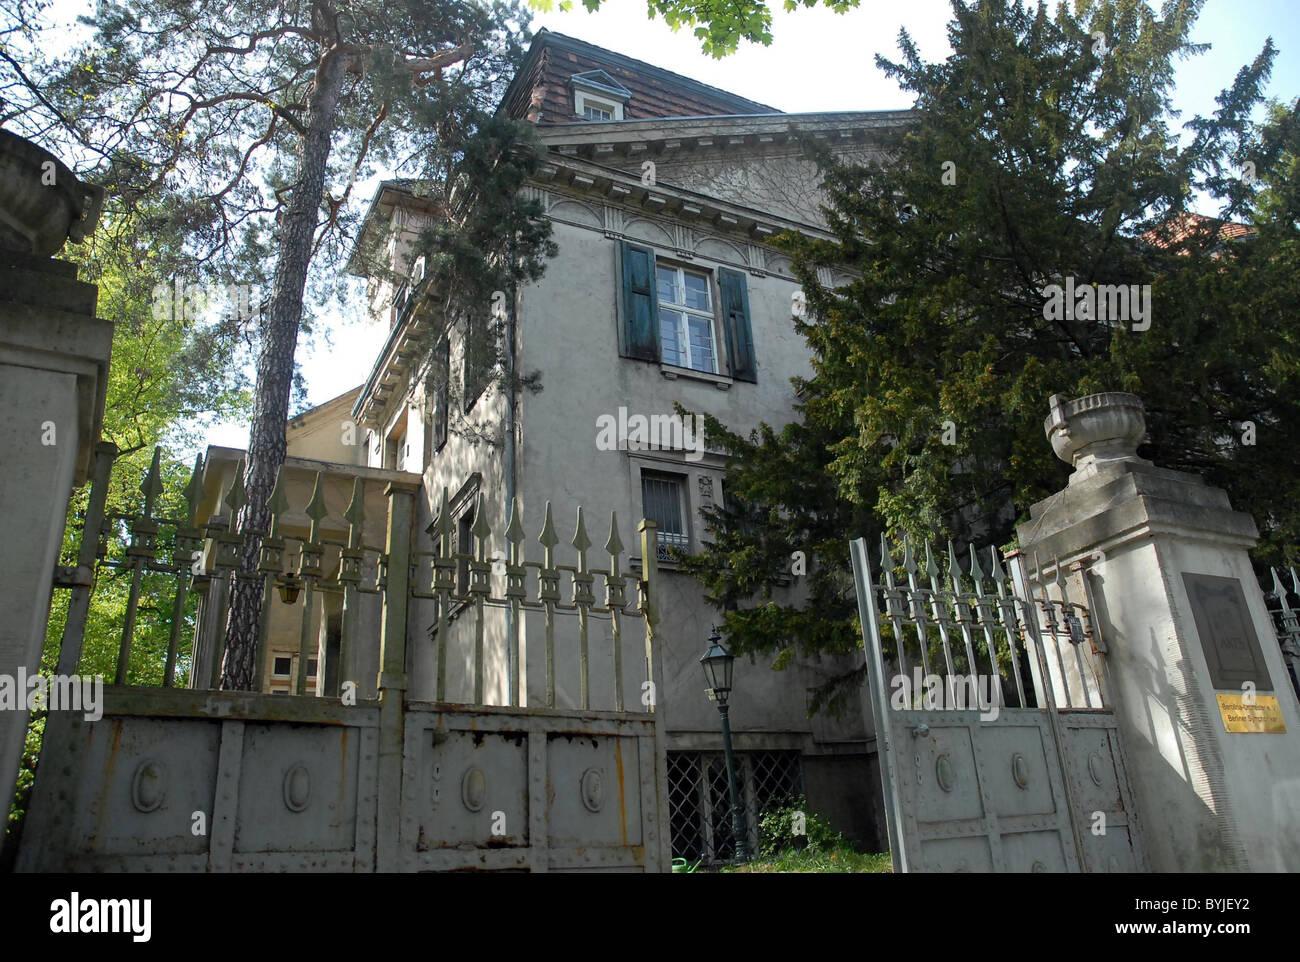 Outside The Villa Hoffmann Where Marilyn Manson Stays Berlin